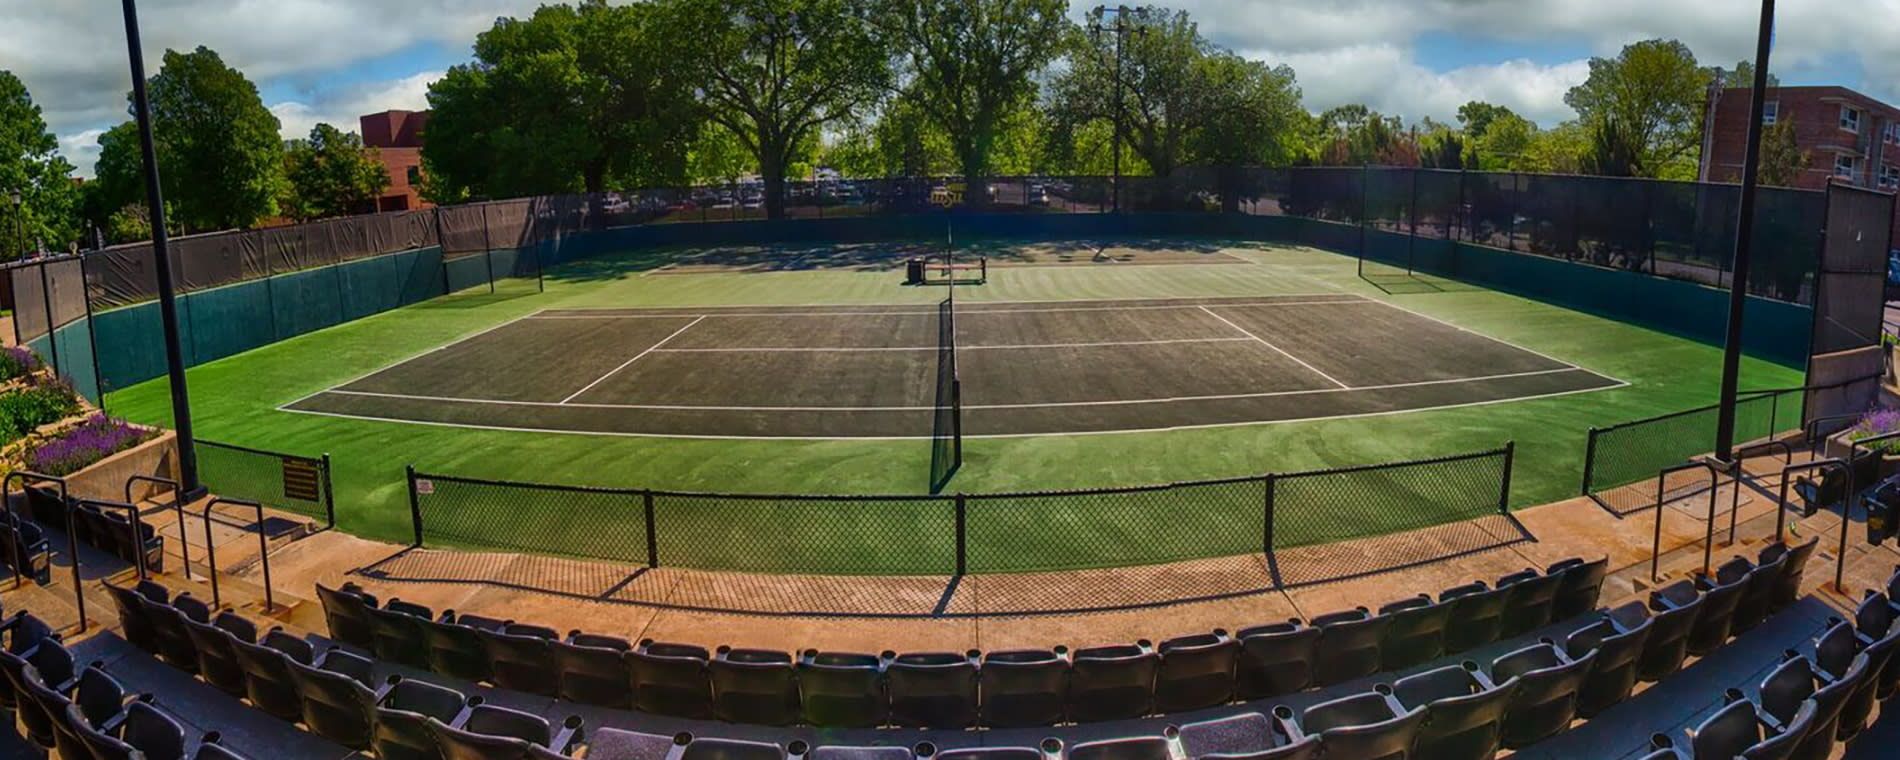 Sheldon Coleman Tennis Court Header